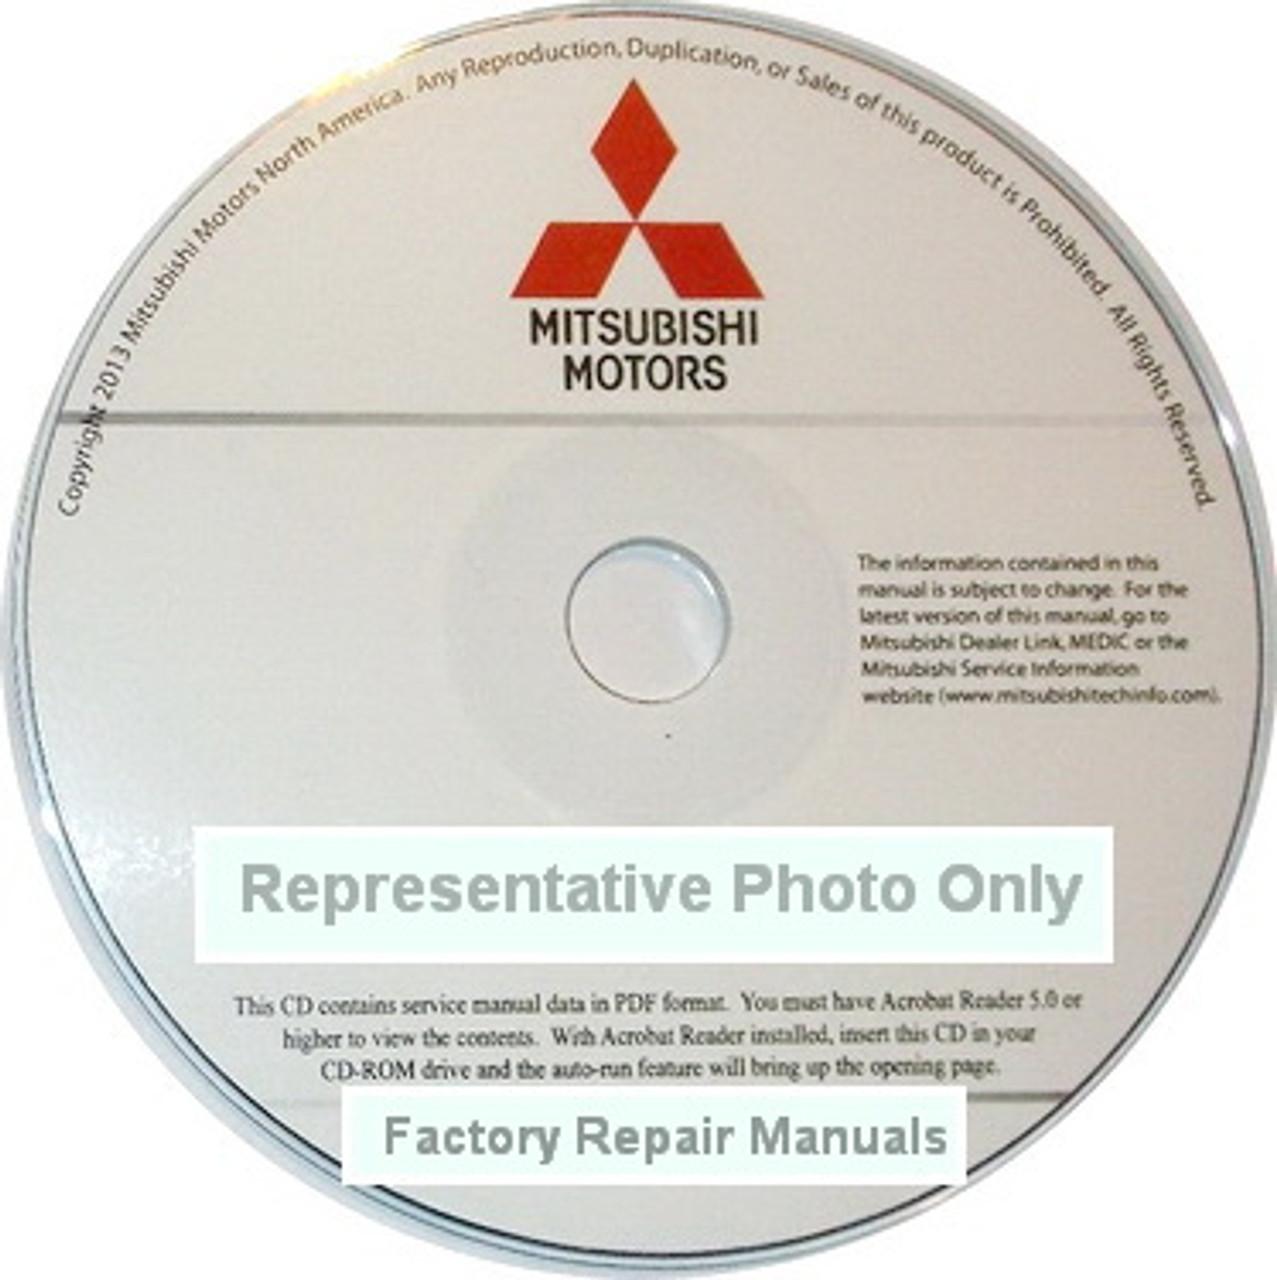 2017 Mitsubishi Mirage Hatchback Factory Service Manual CD Original Shop  Repair